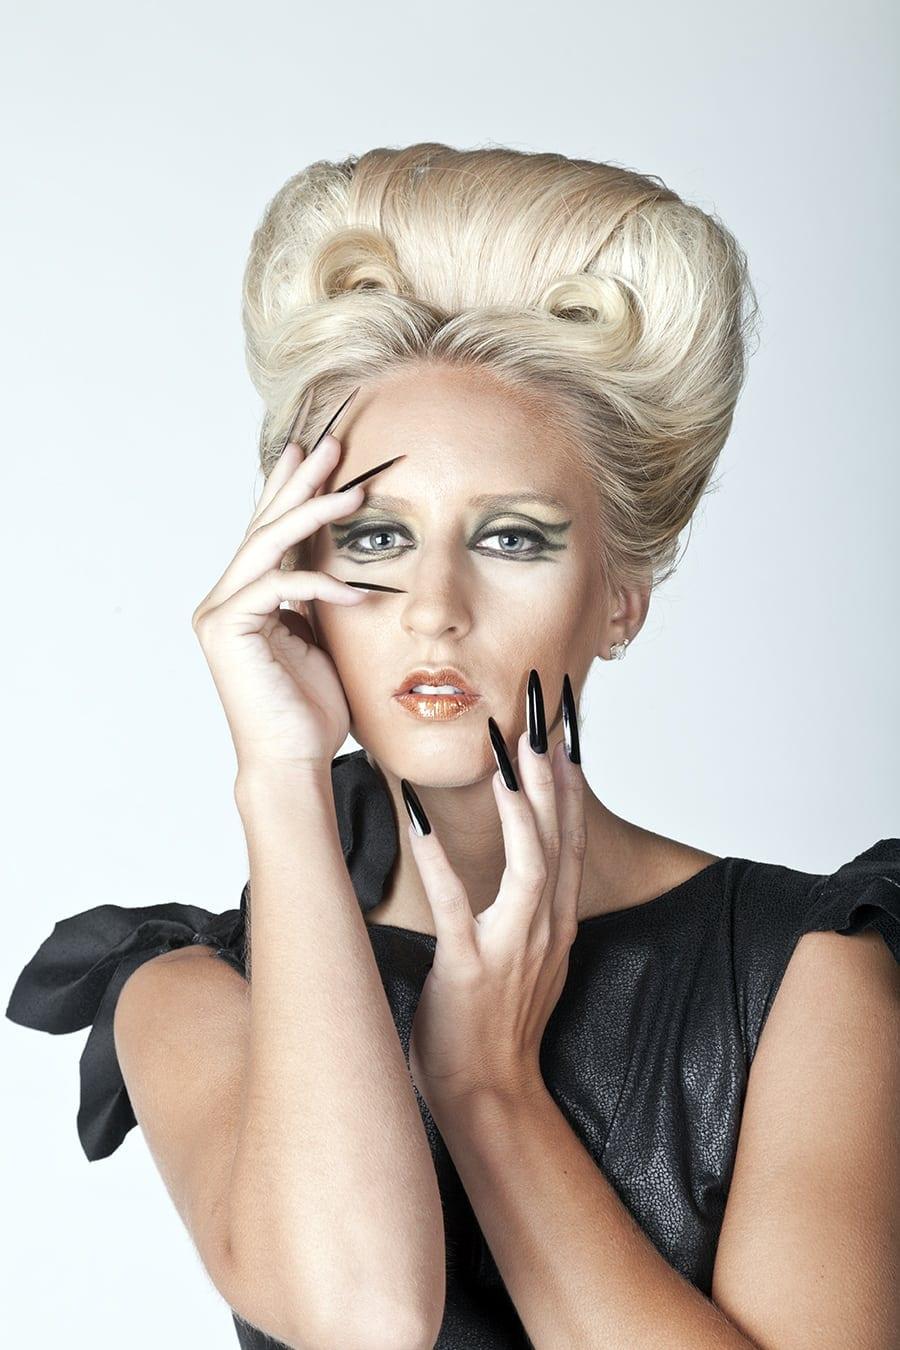 Location: Atlanta, GA Model: Katee Lee Hair: Angela Moceri Make-UP: Isabelle Schreier Fashion designer: Milton Aaron, Toi Williams Theary Sim whose creative vision designed Photographer : Terry Check